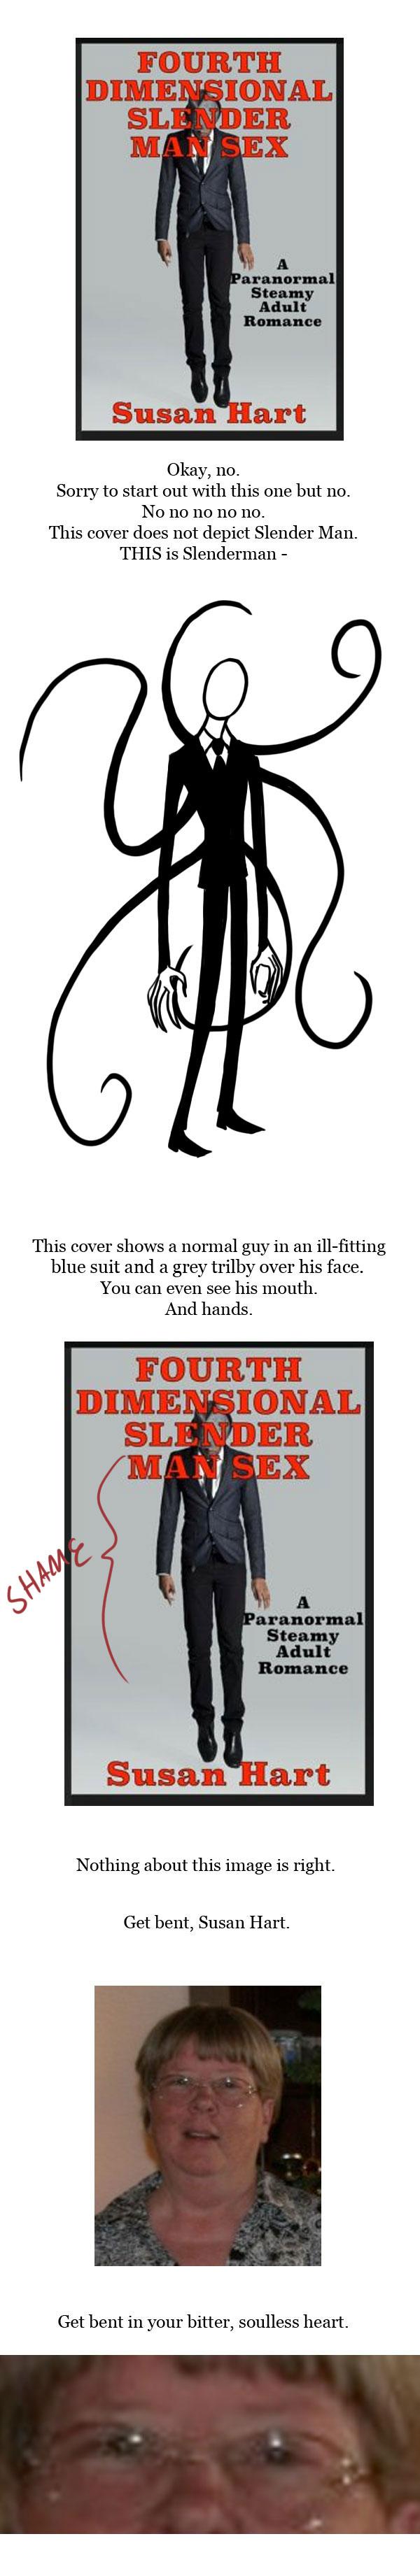 4th Dimensional Slenderman Sex